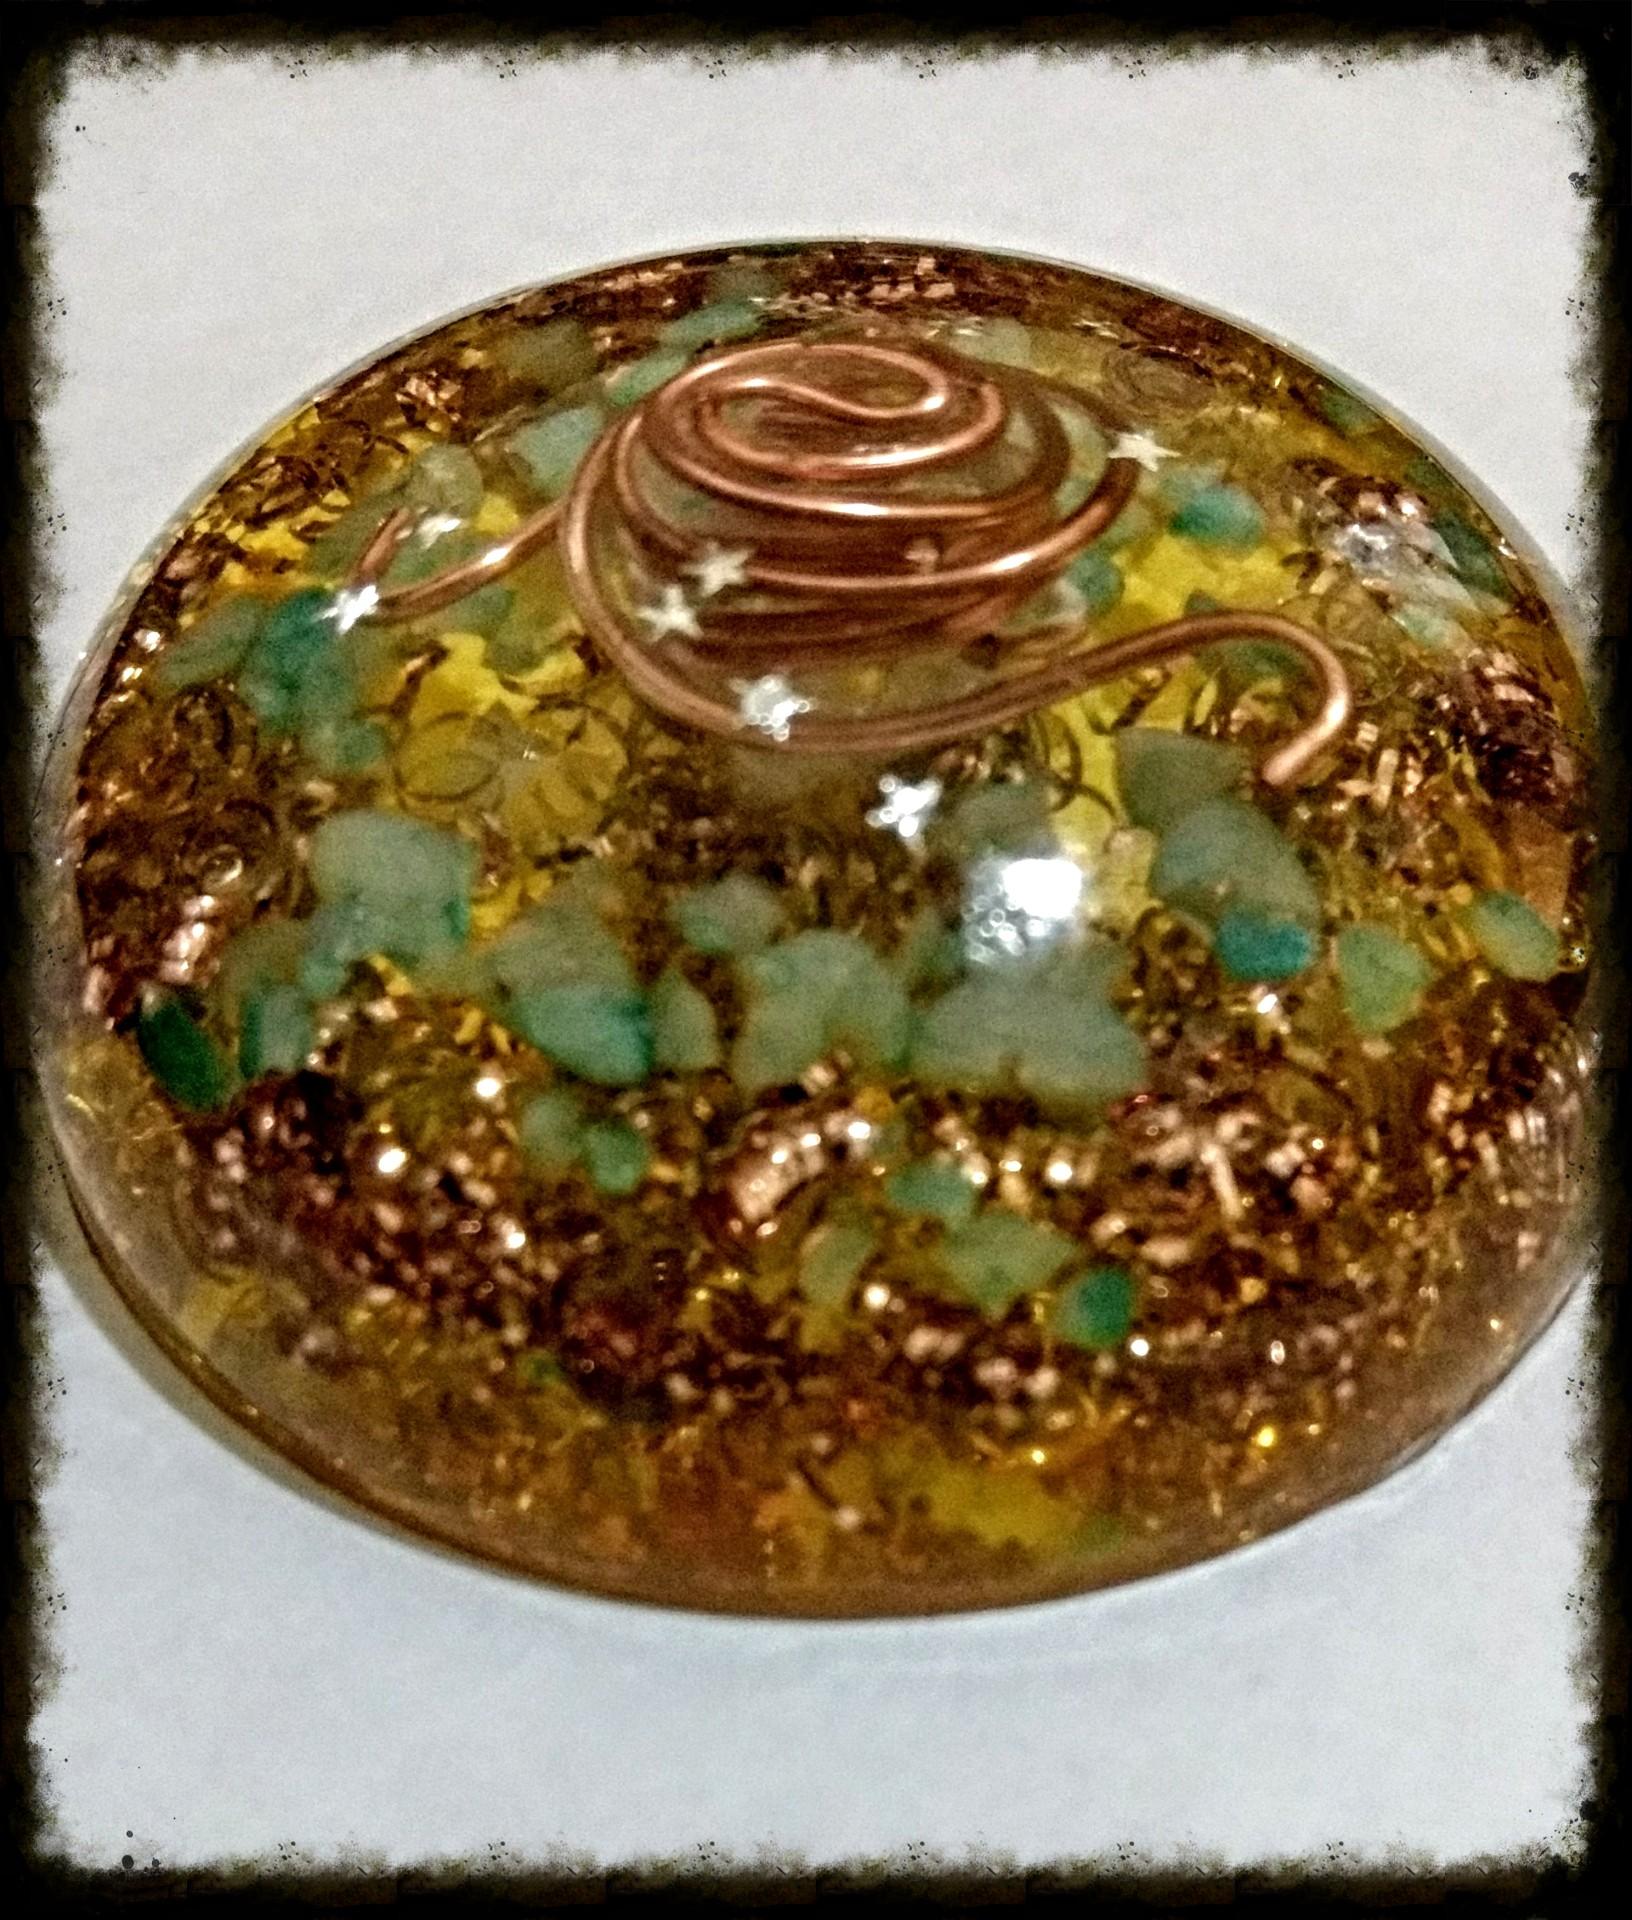 1/2 Esfera de Orgonita, cobre, cuarzo cristal, turquesa verde y cobre